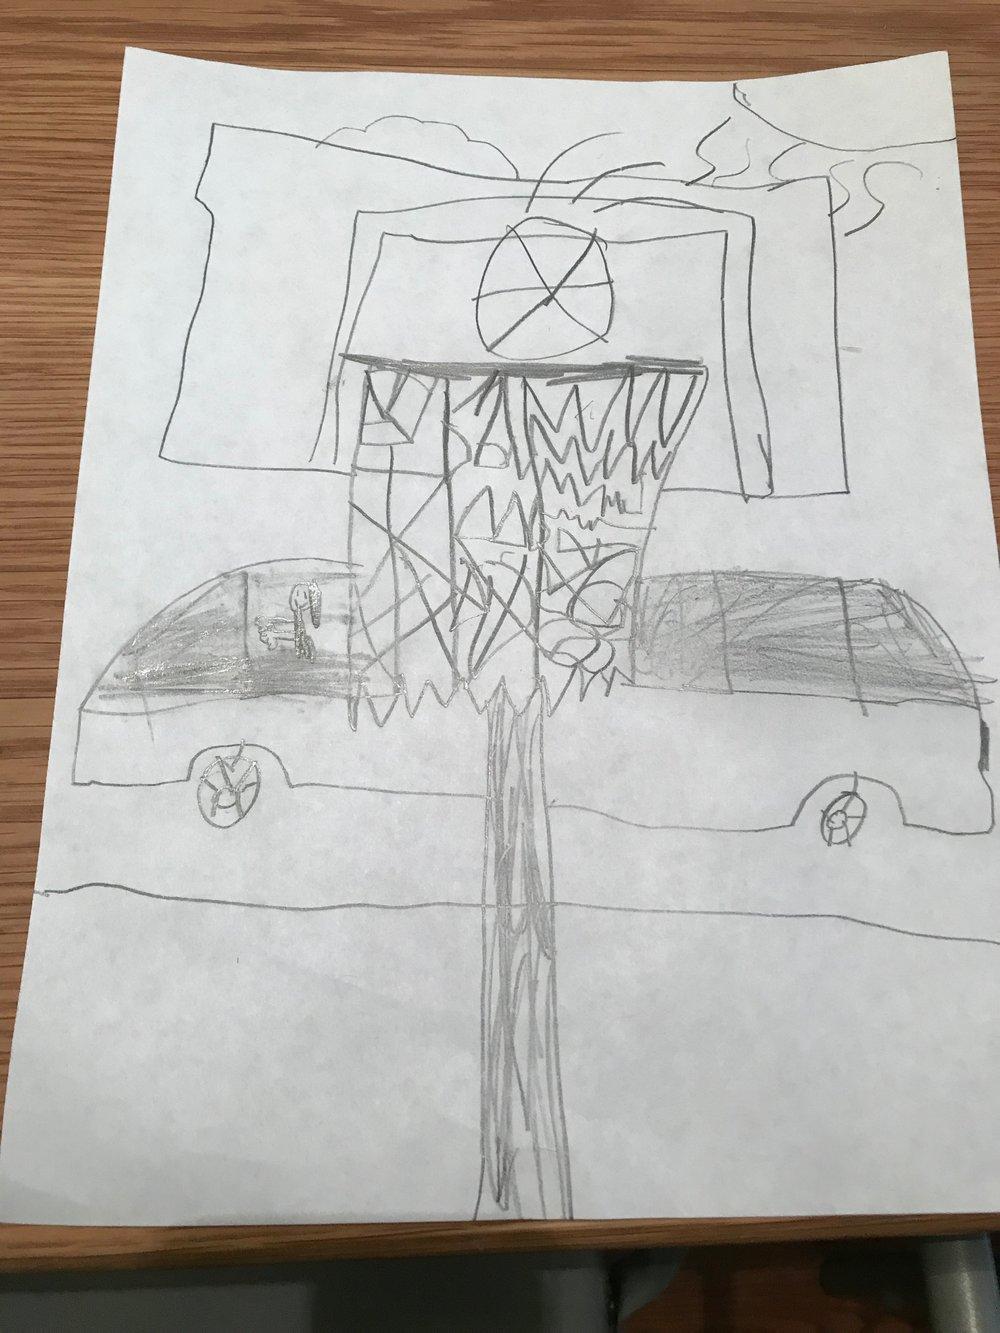 Imogen Oakes/ Basketball Hoop Design